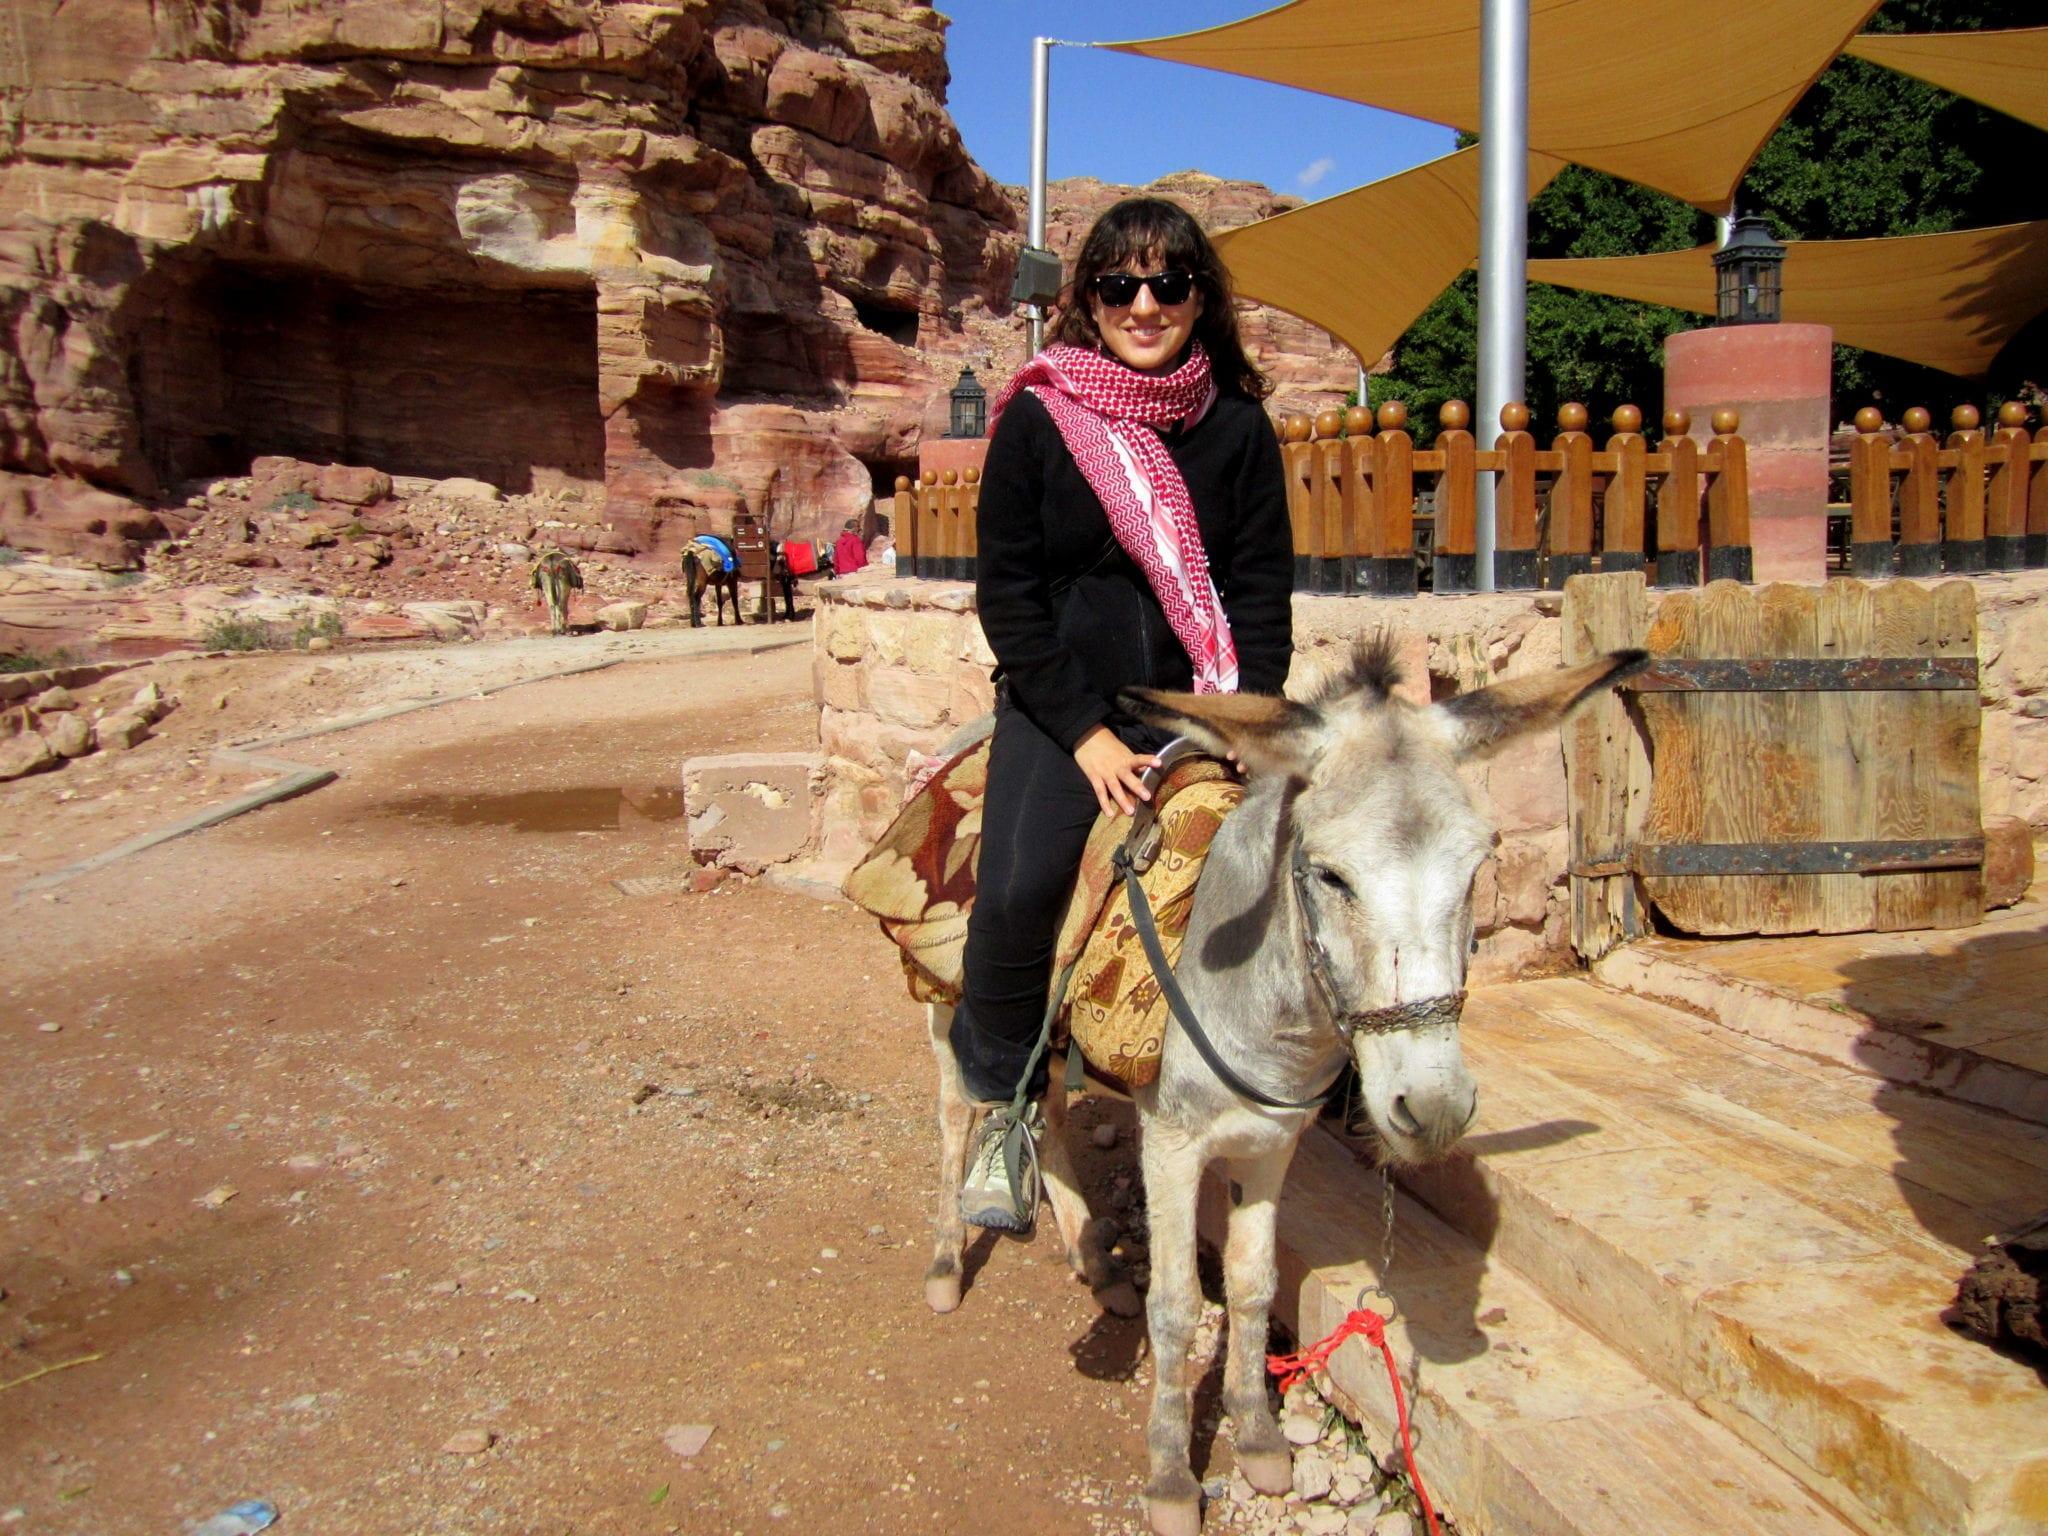 Adventurous Kate Rides a Donkey; Hilarity Does Not Ensue